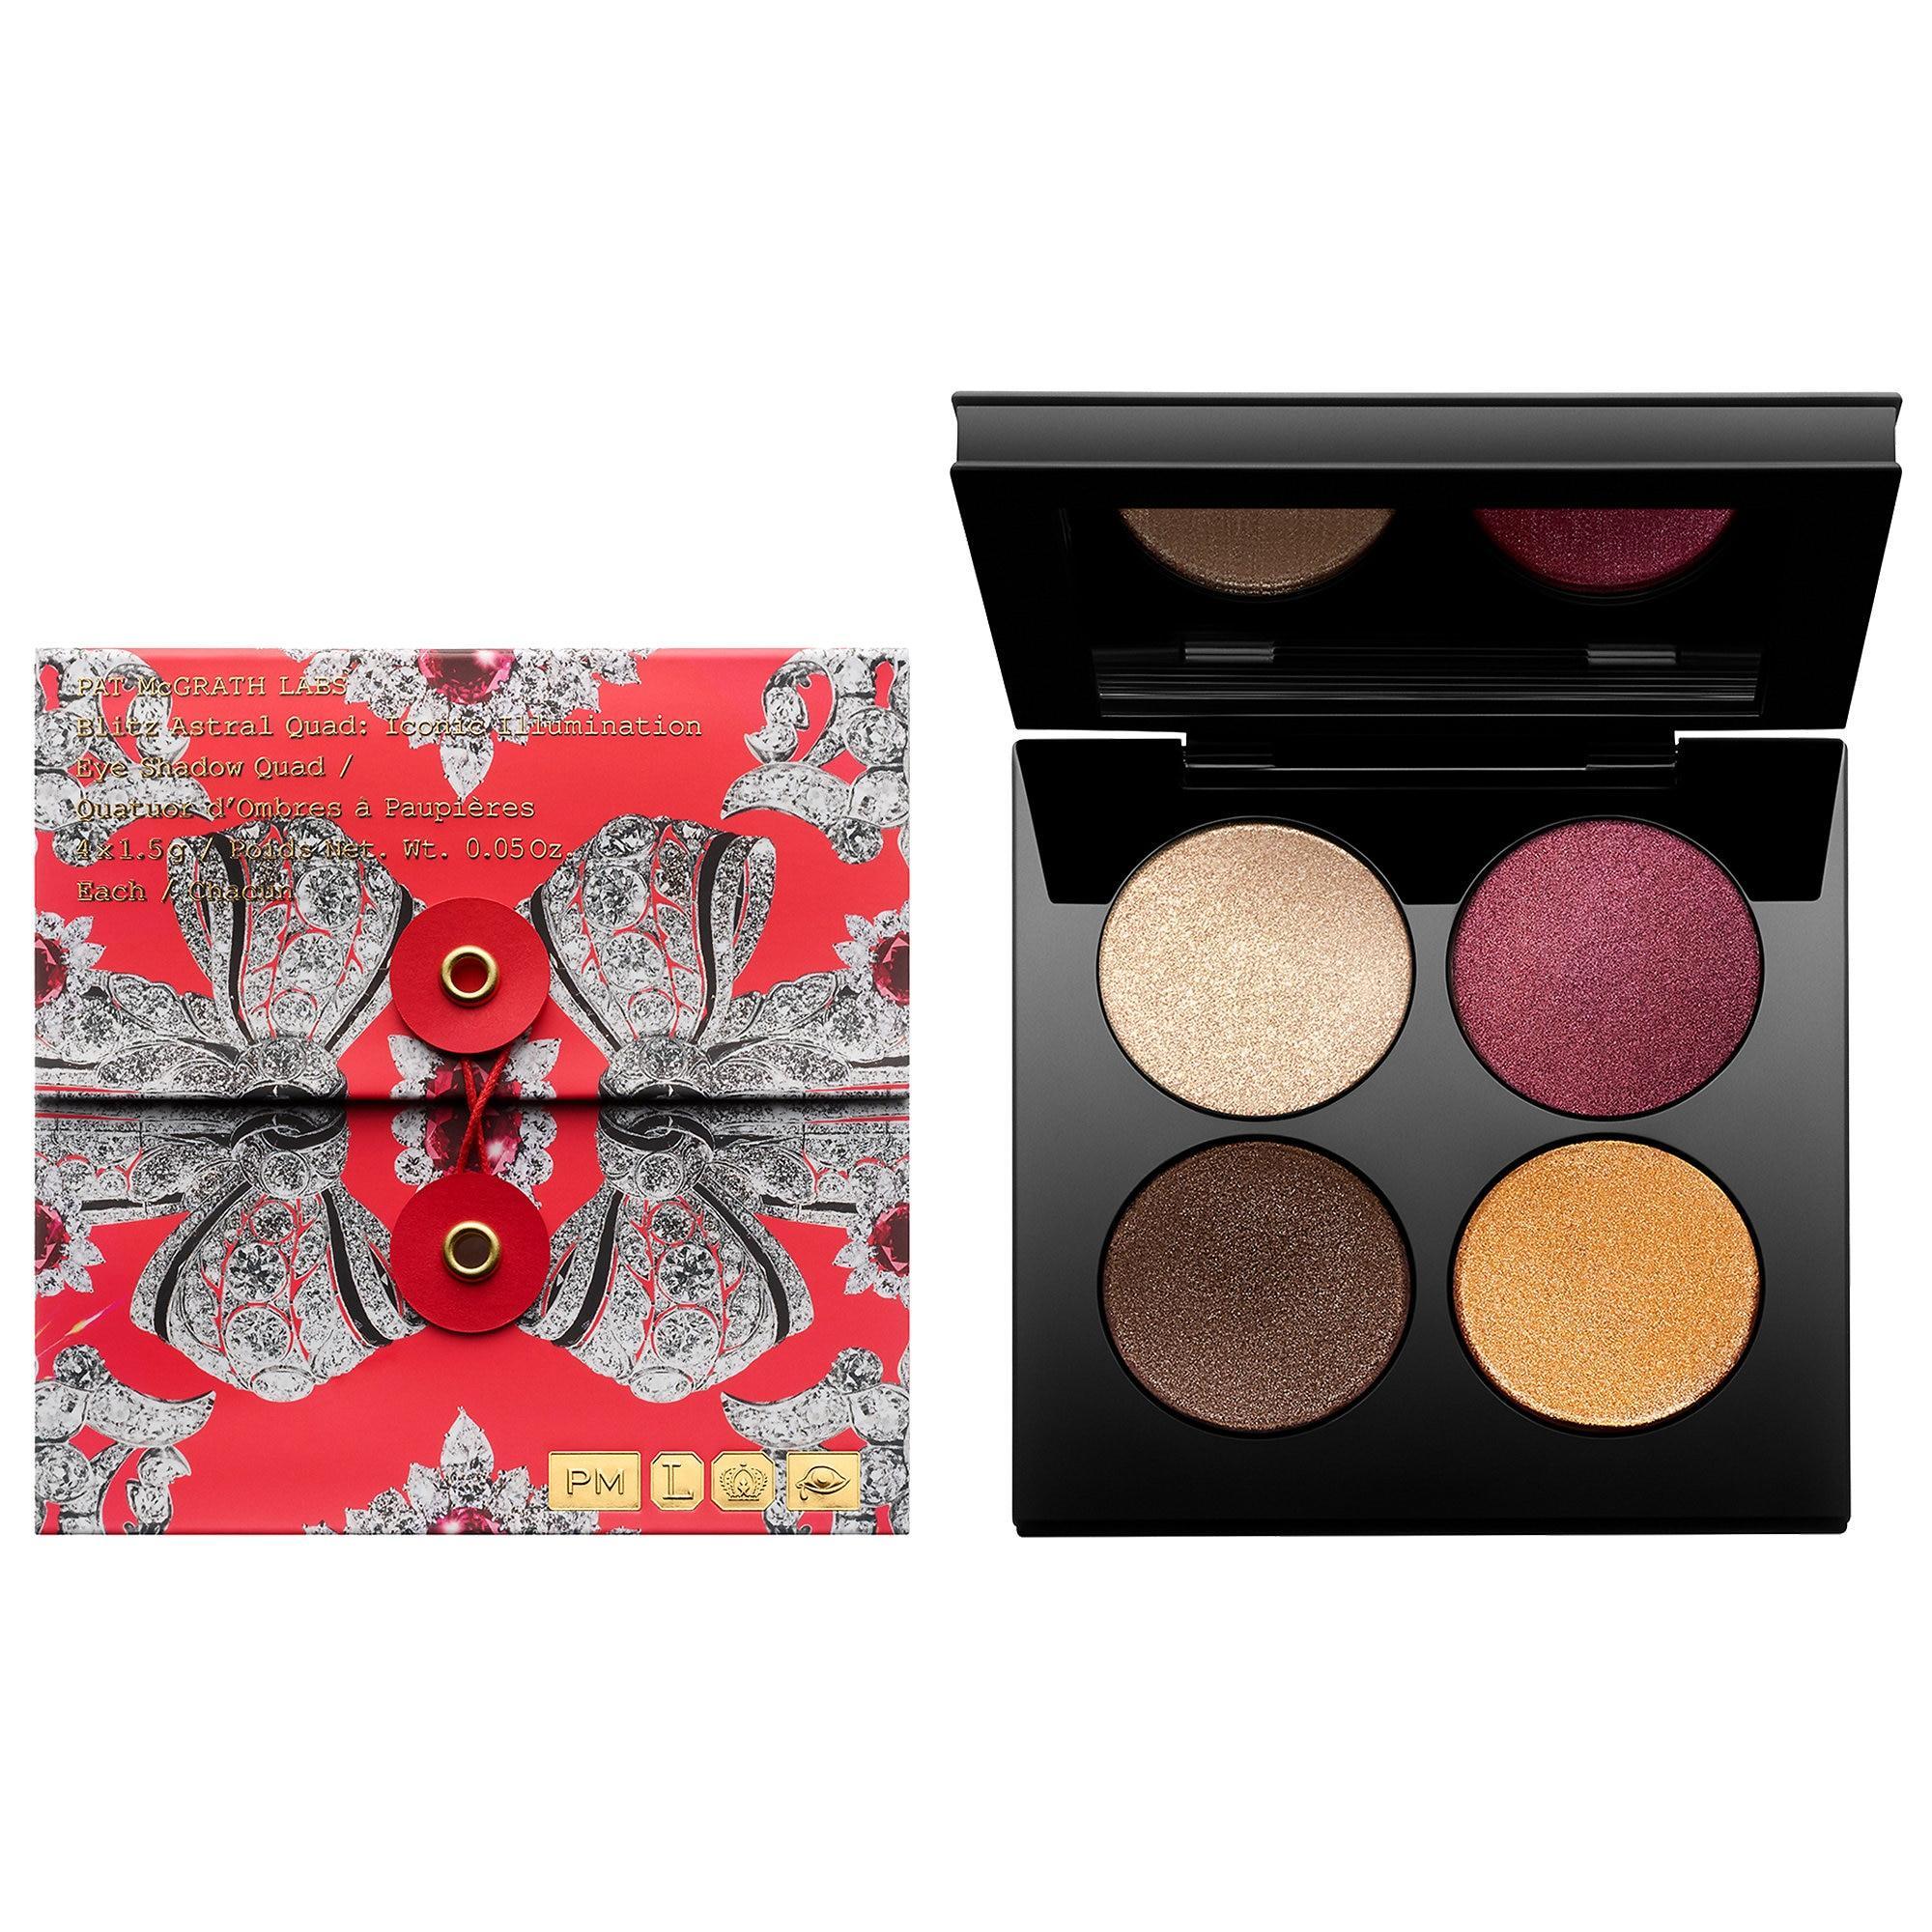 Pat McGrath Labs Blitz Astral Quad Eyeshadow Palette Iconic Illumination